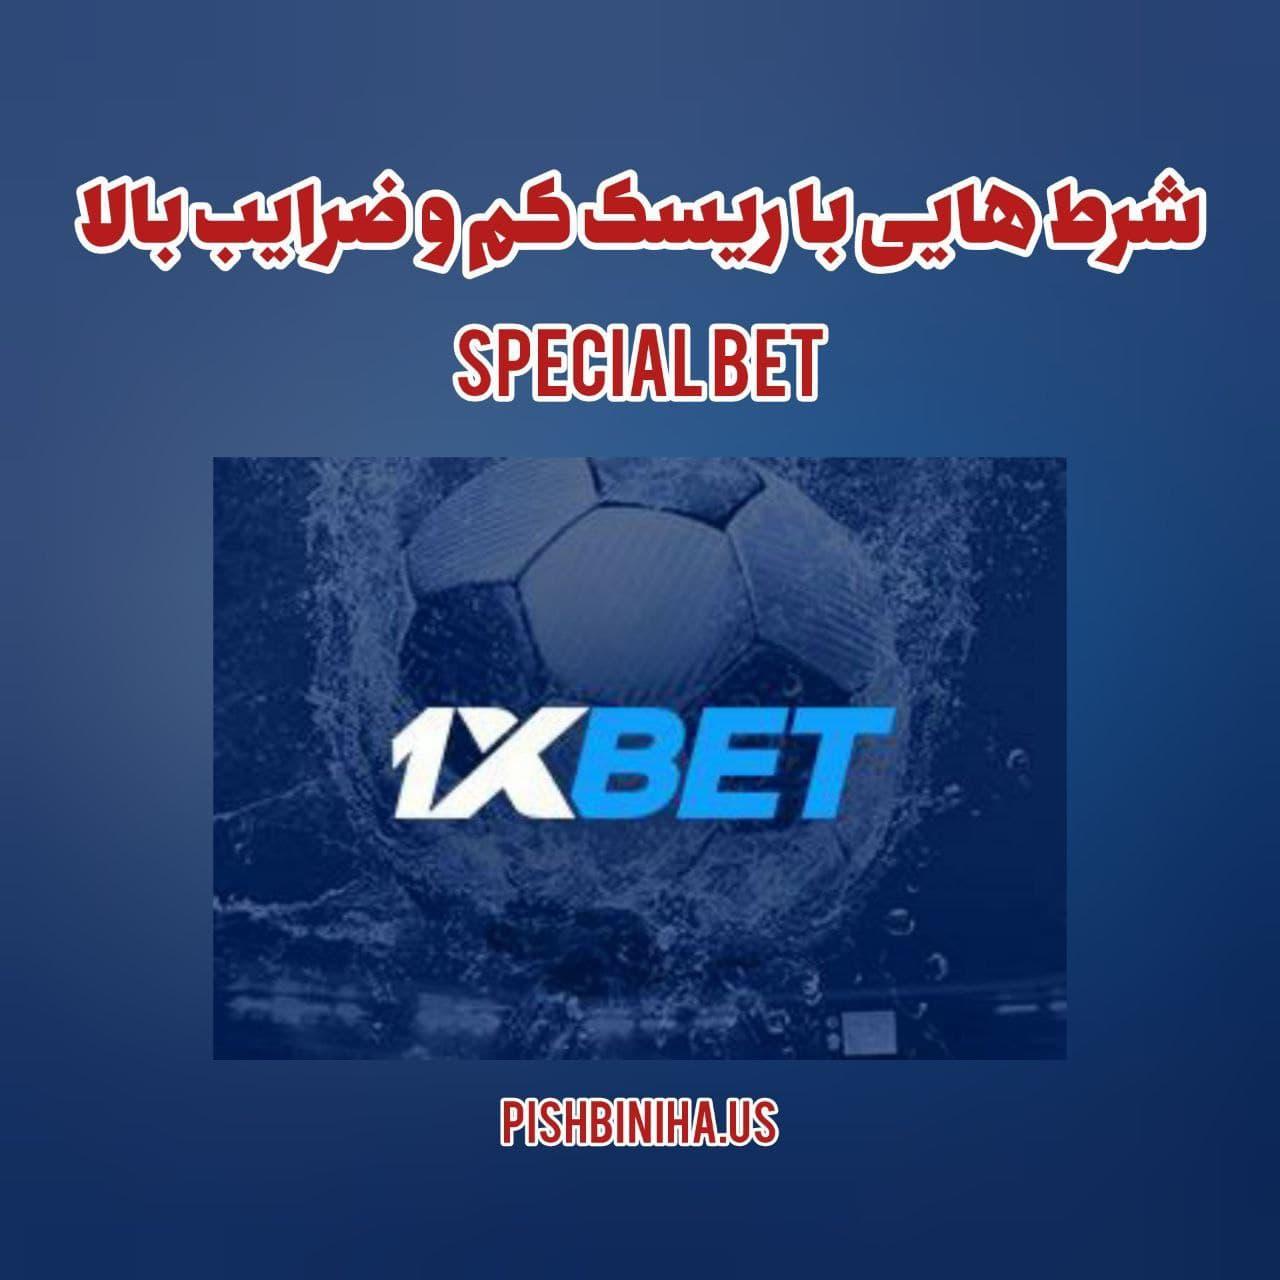 Special bet | شرط هایی با ریسک کم و ضرایب بالا